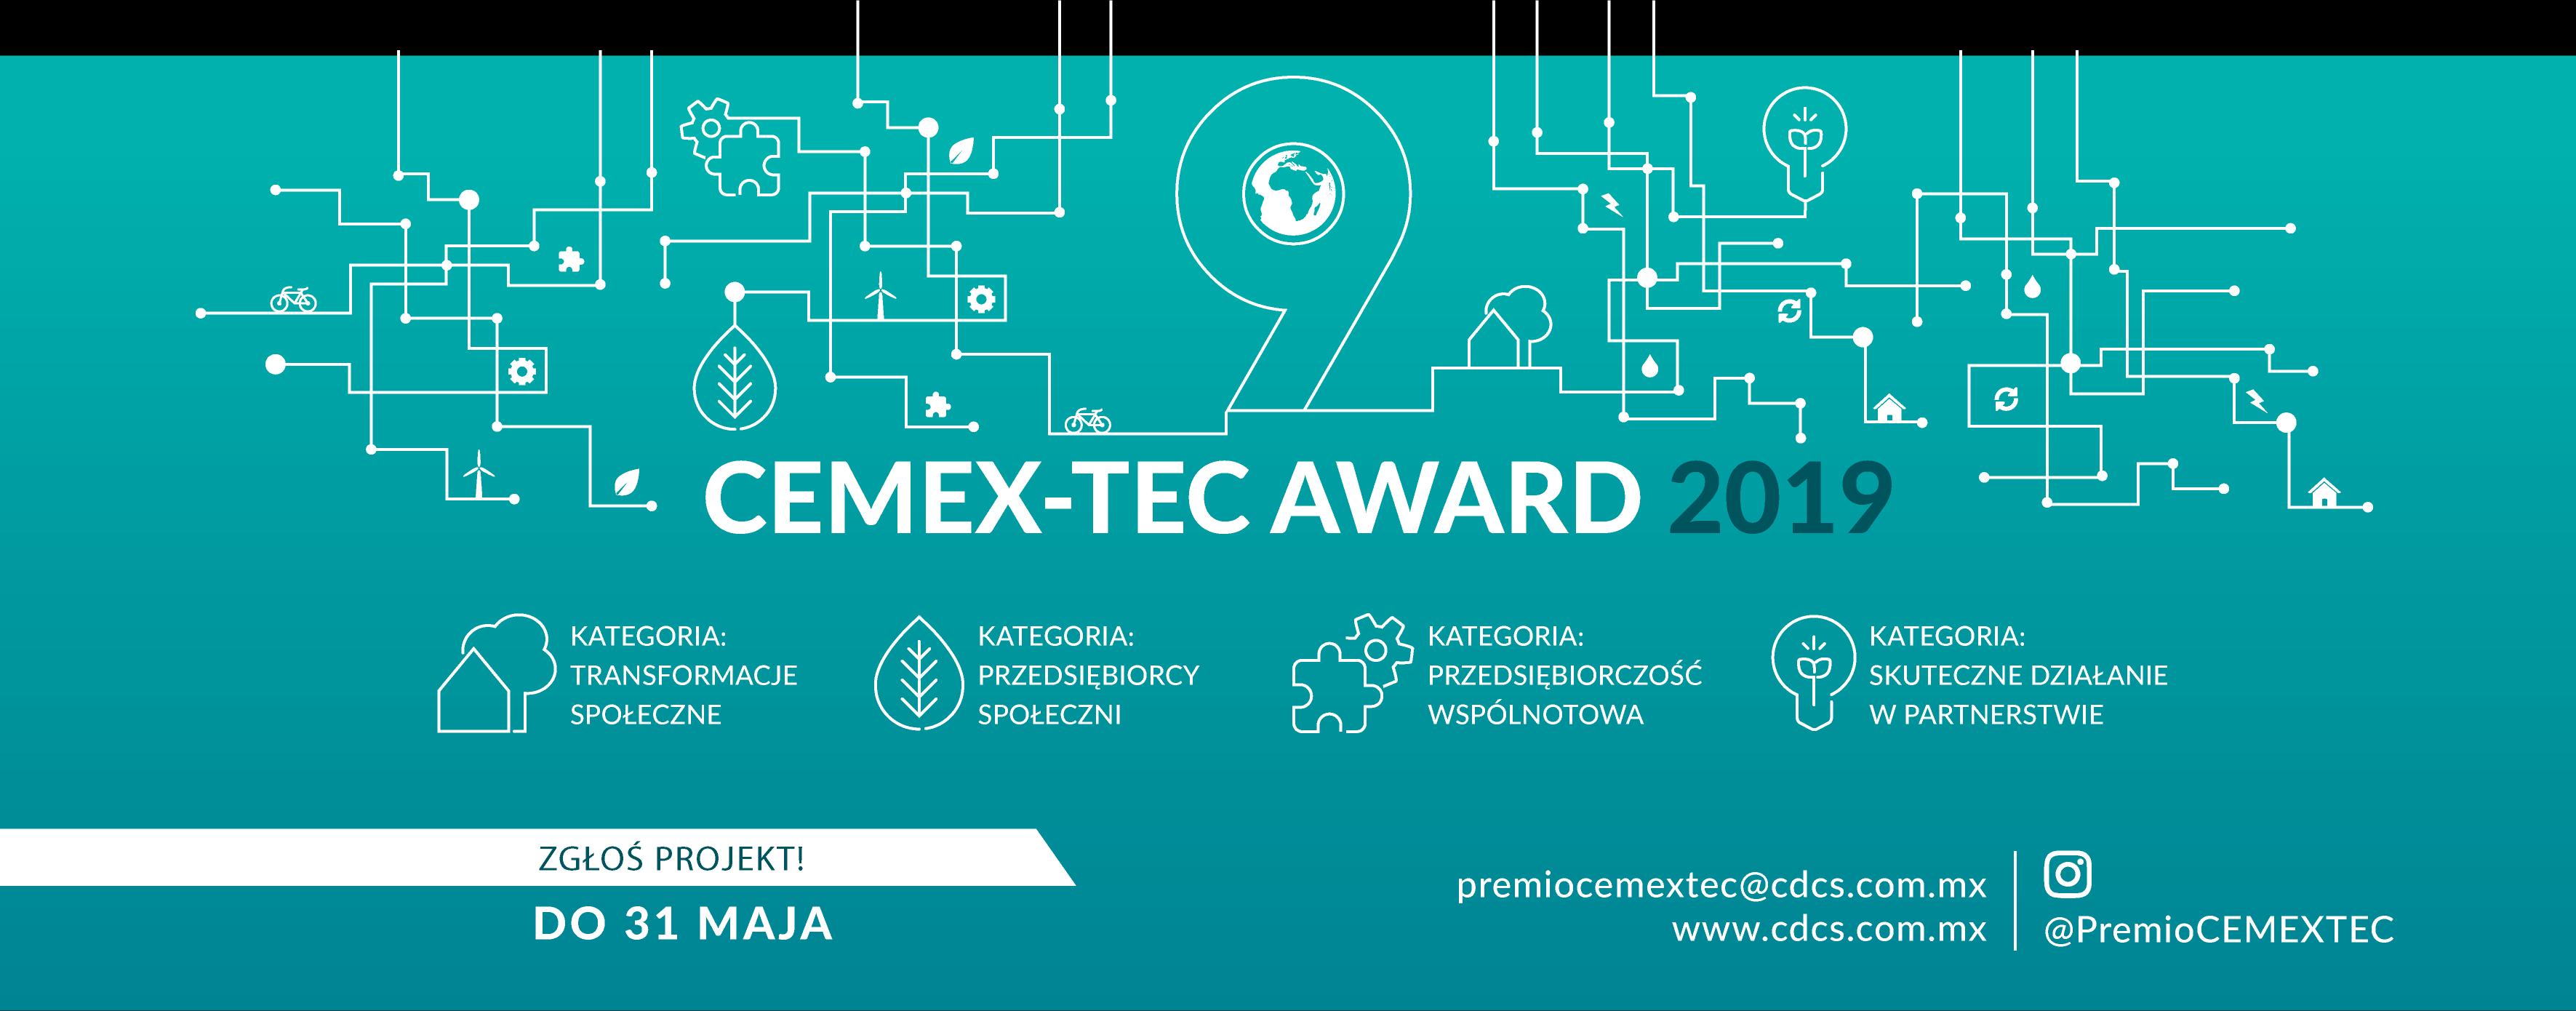 KONKURS CEMEX-TEC AWARD 2019